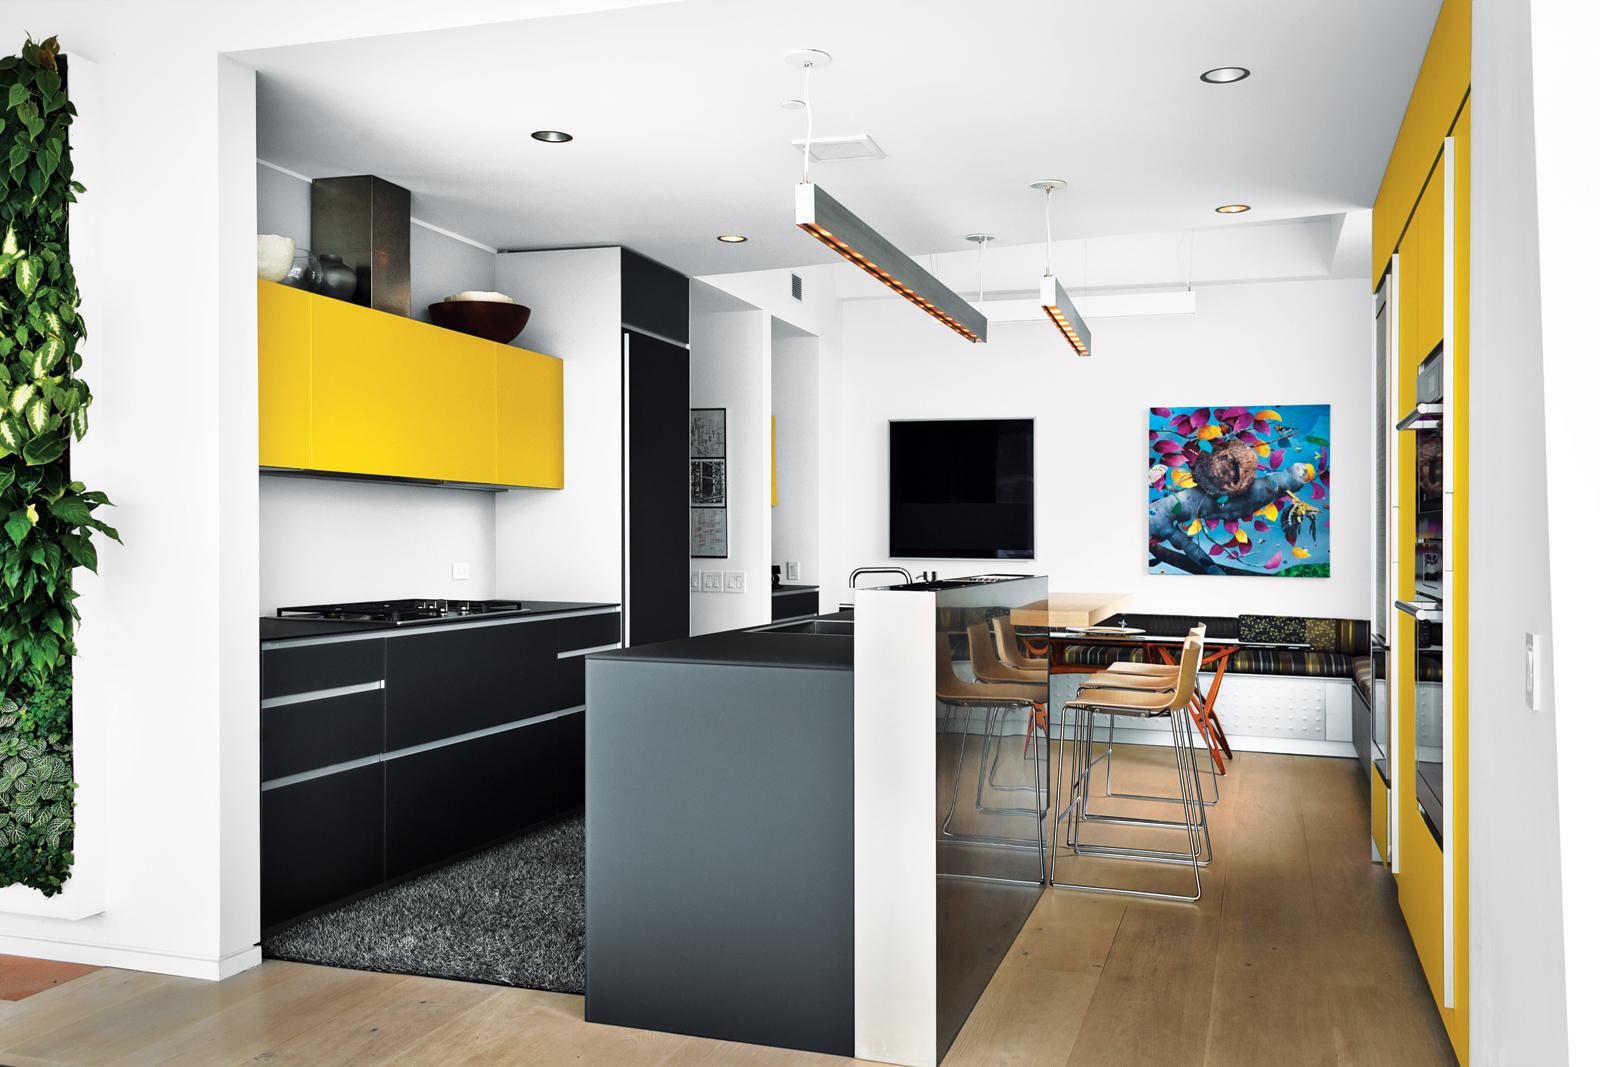 Modern kitchen with Artematica itrum glass system